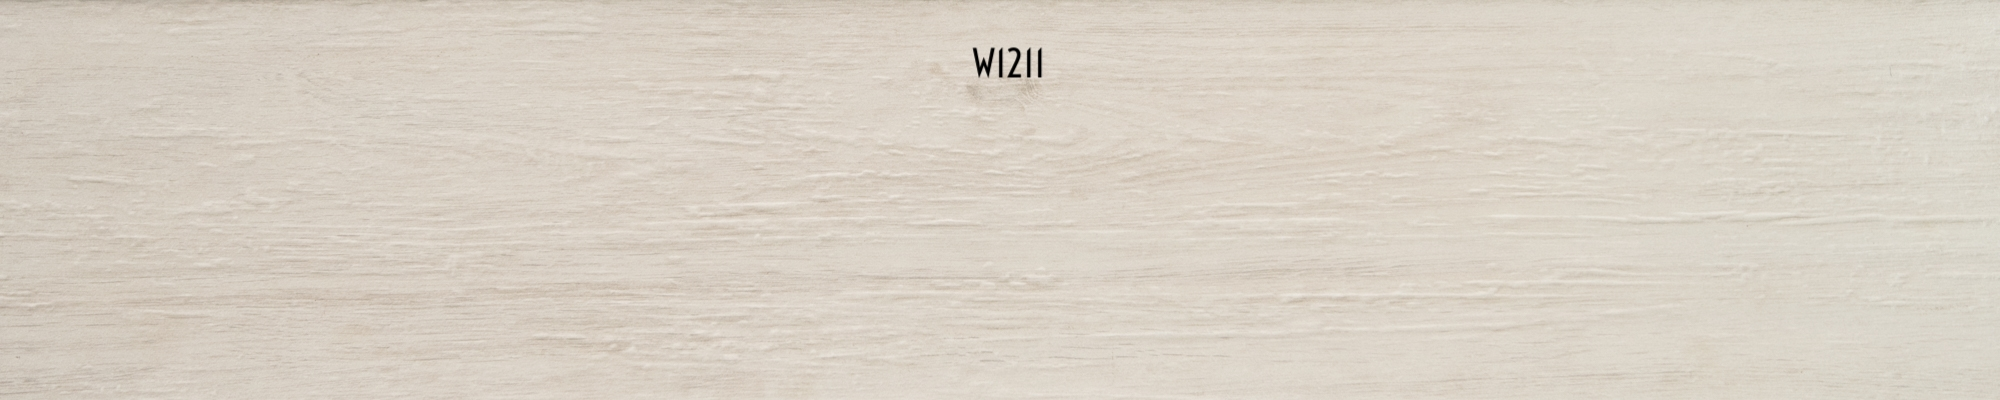 W1211